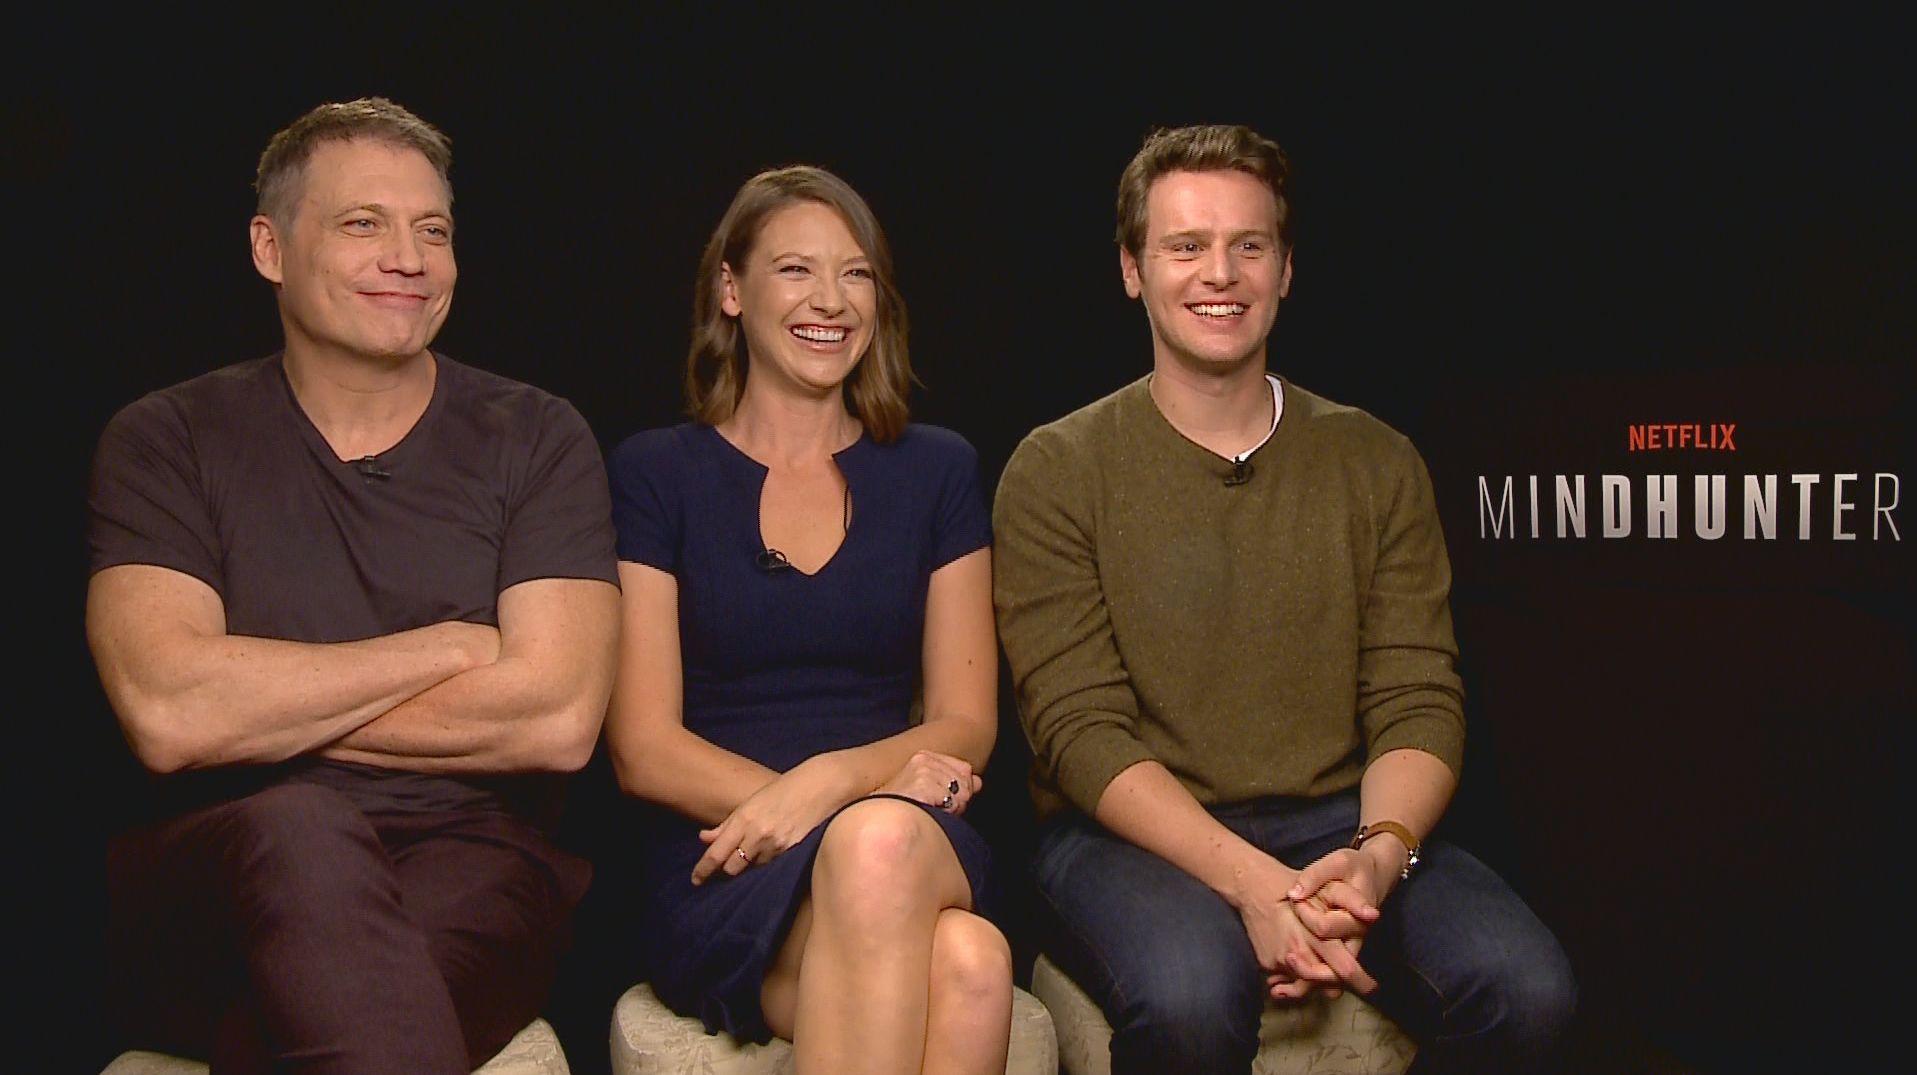 Mindhunter: Jonathan Groff, Anna Torv & Holt McCallany on David Fincher   Collider